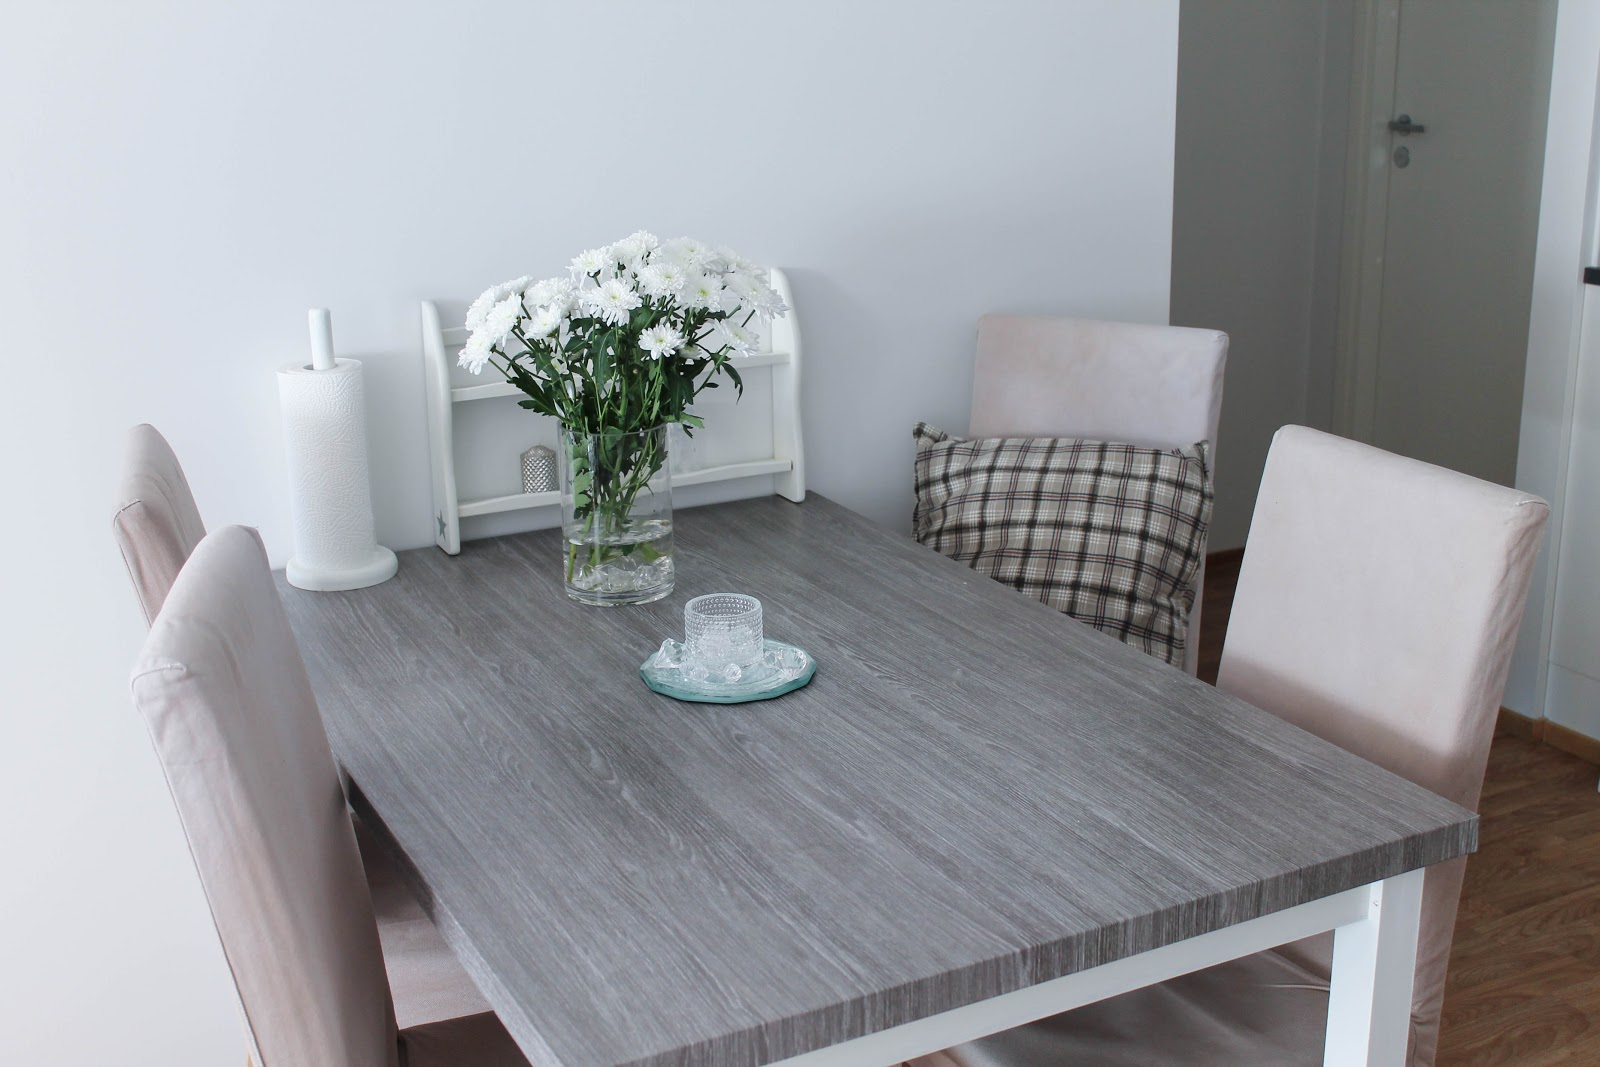 helmoissa diy dc fix. Black Bedroom Furniture Sets. Home Design Ideas